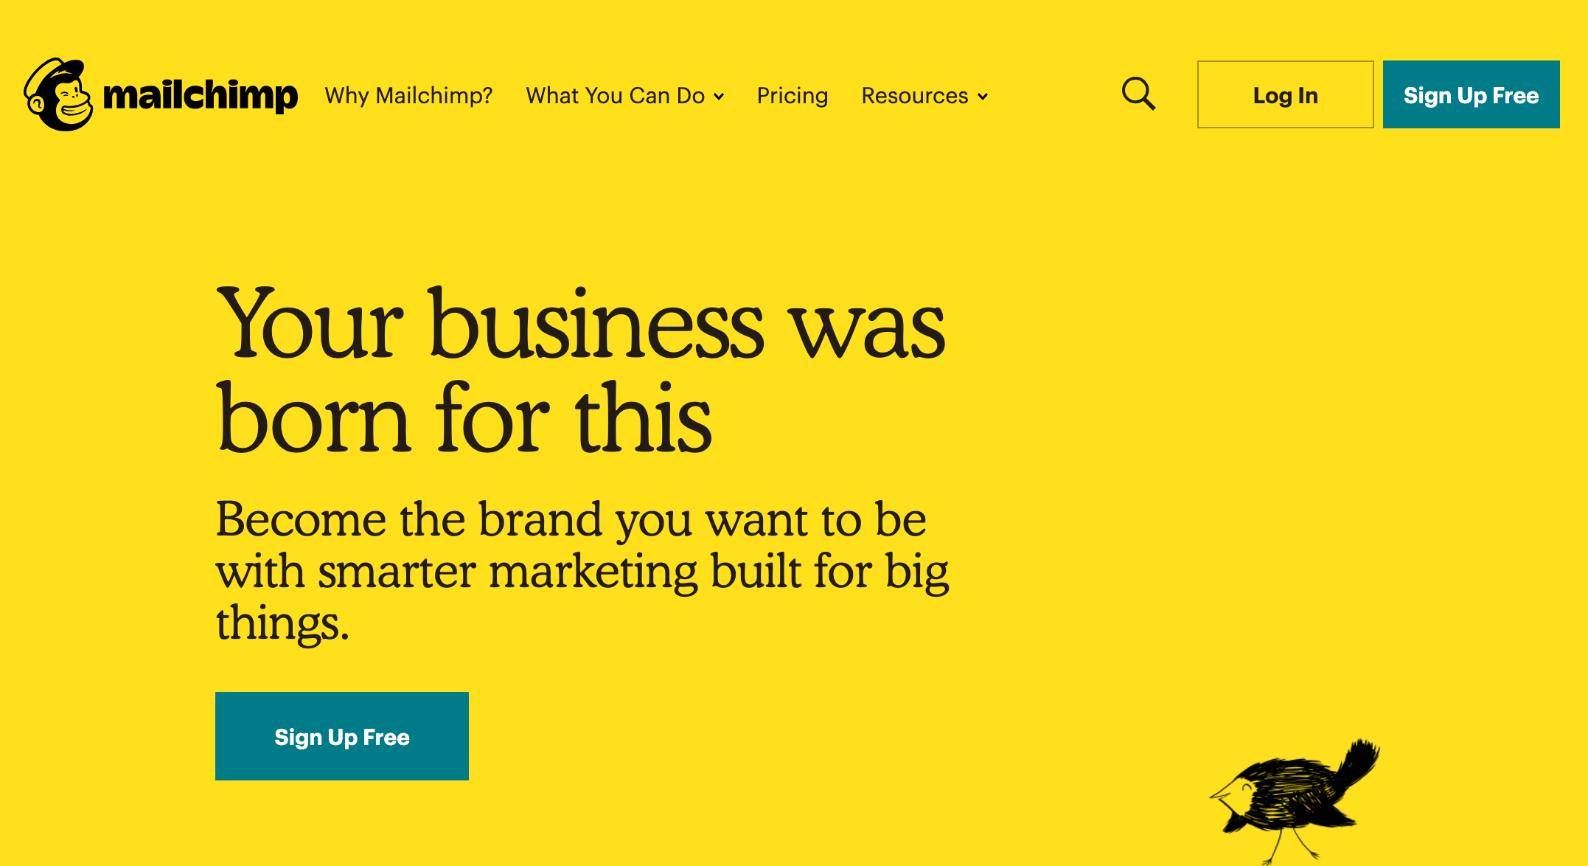 MailChimp email marketing